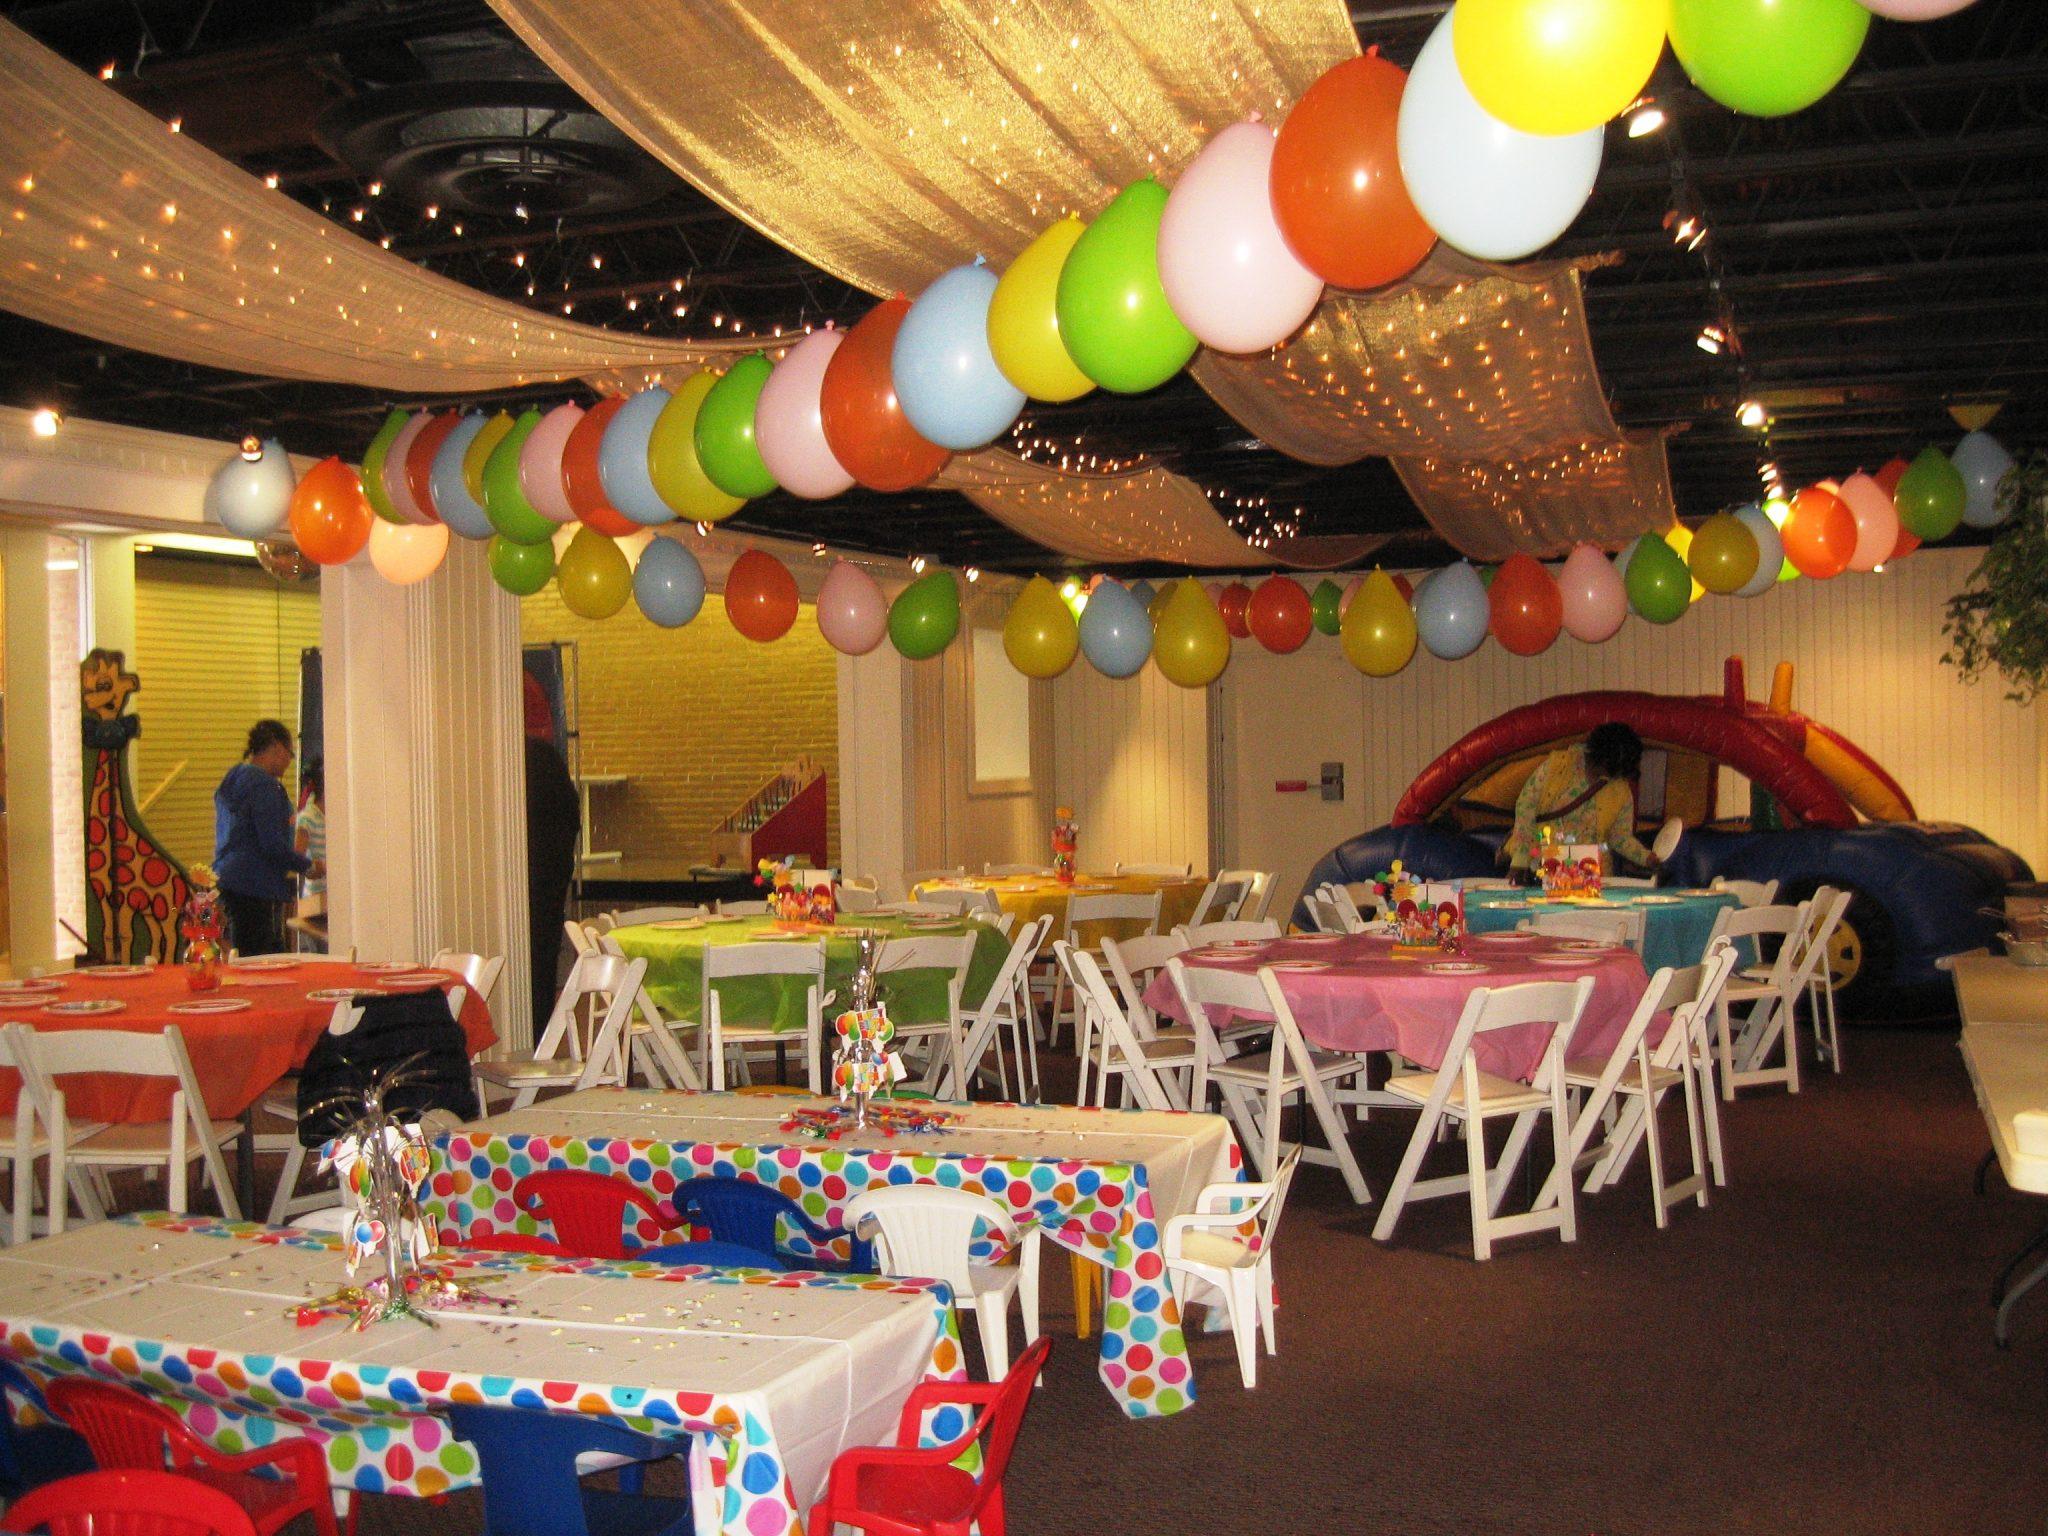 children u2019s party packages  u2013 baltimore u0026 39 s best events